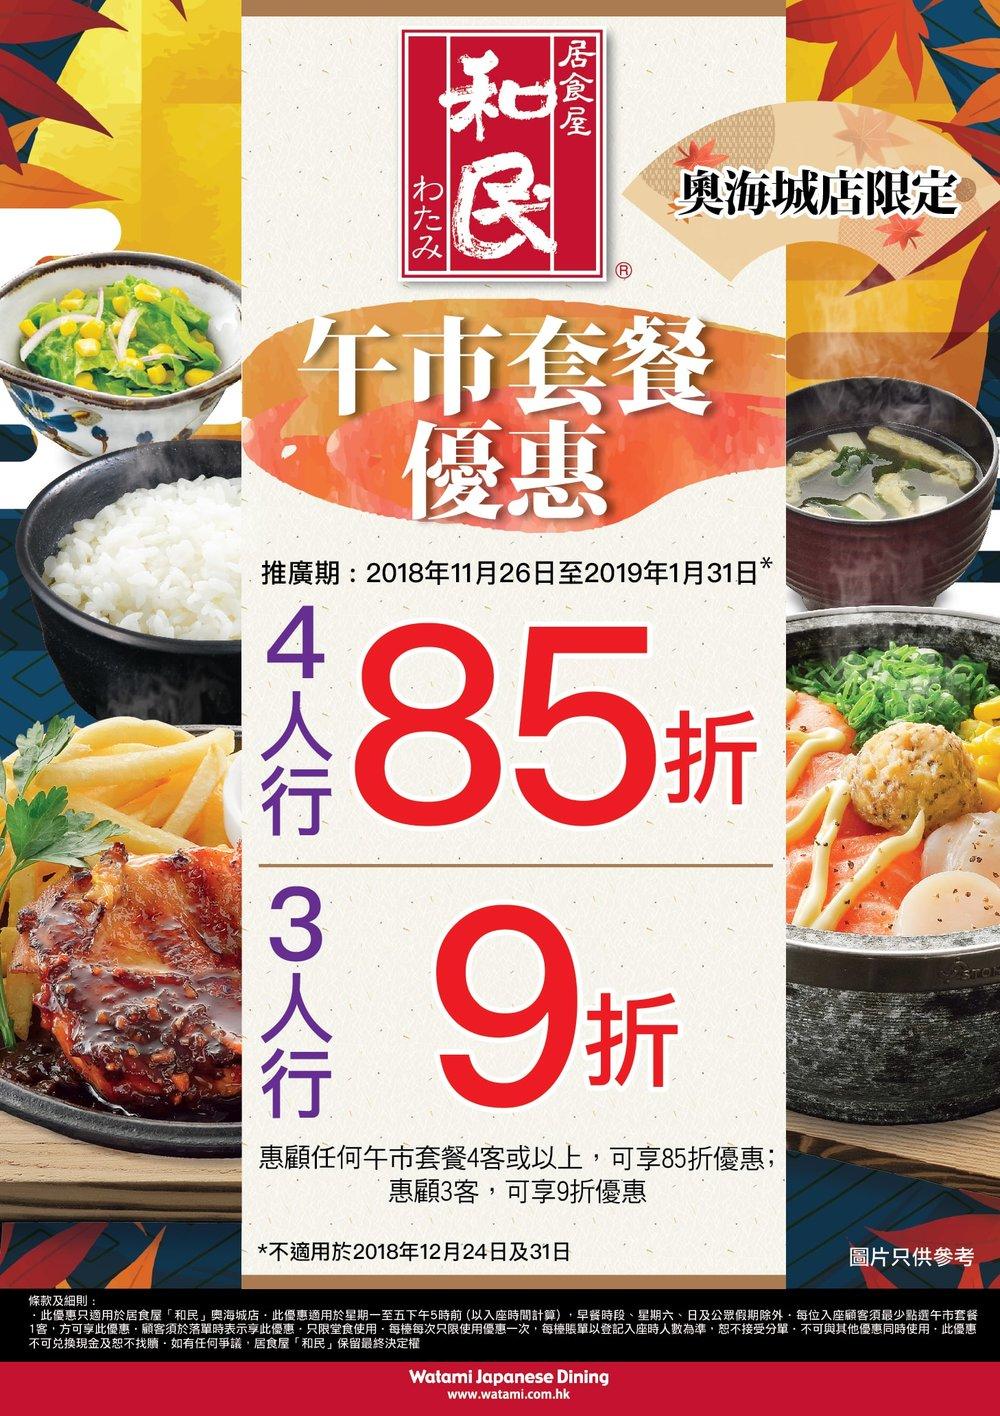 OC Lunch Promotion_final_AW-02-min.jpg